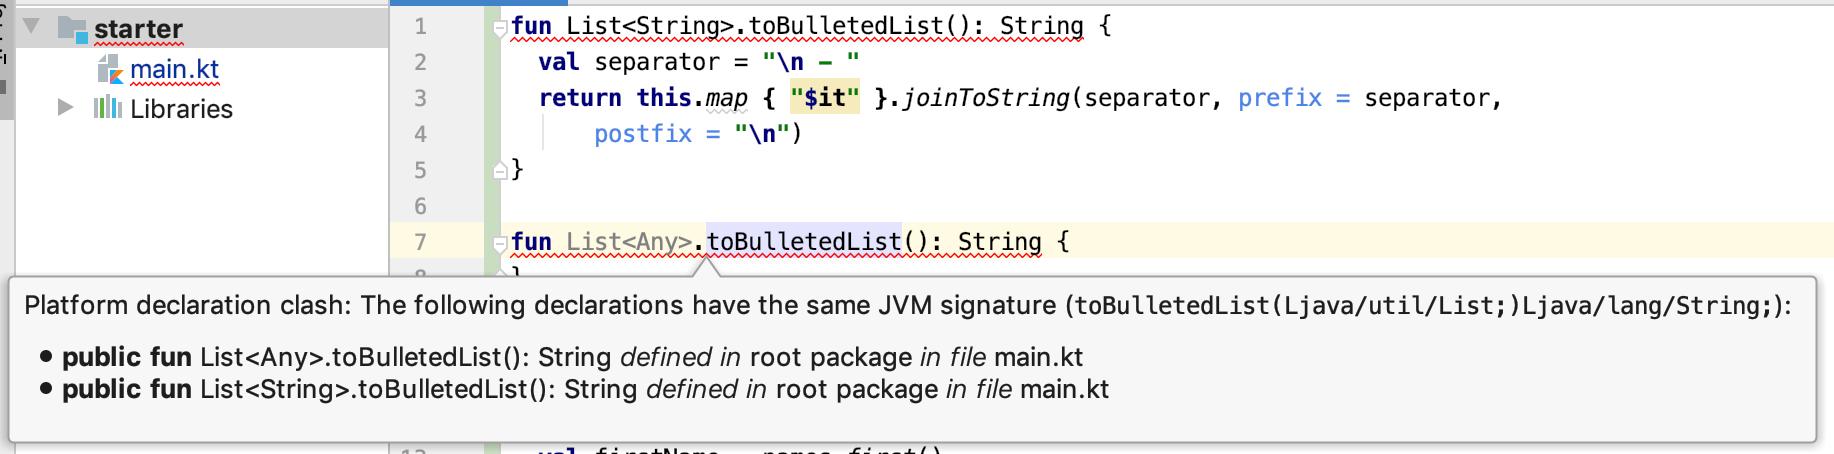 Platform declaration clash: The following declarations have the same JVM signature